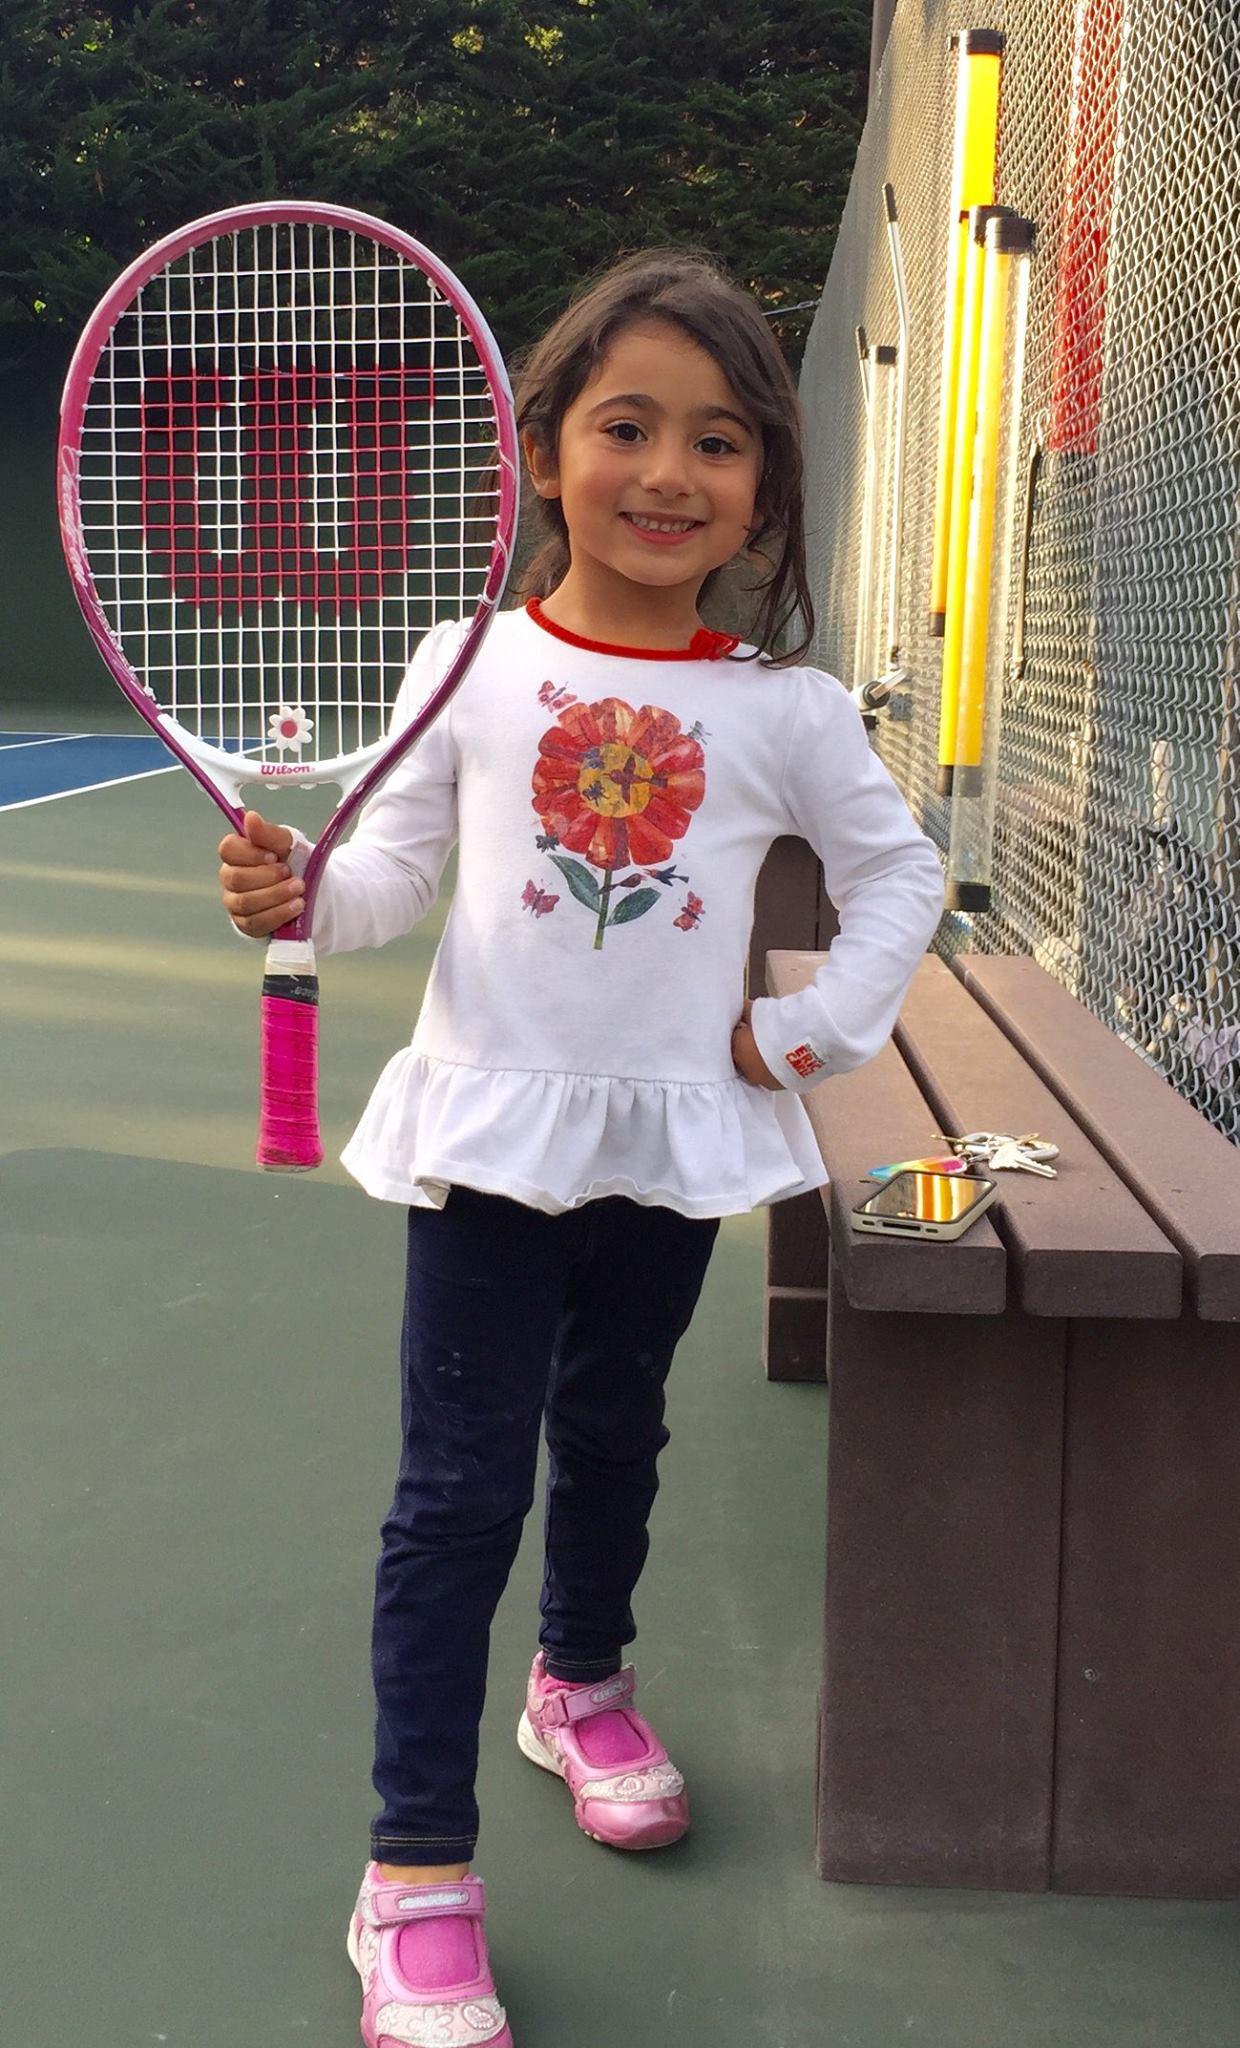 cute.young.girl.tennis.jpg